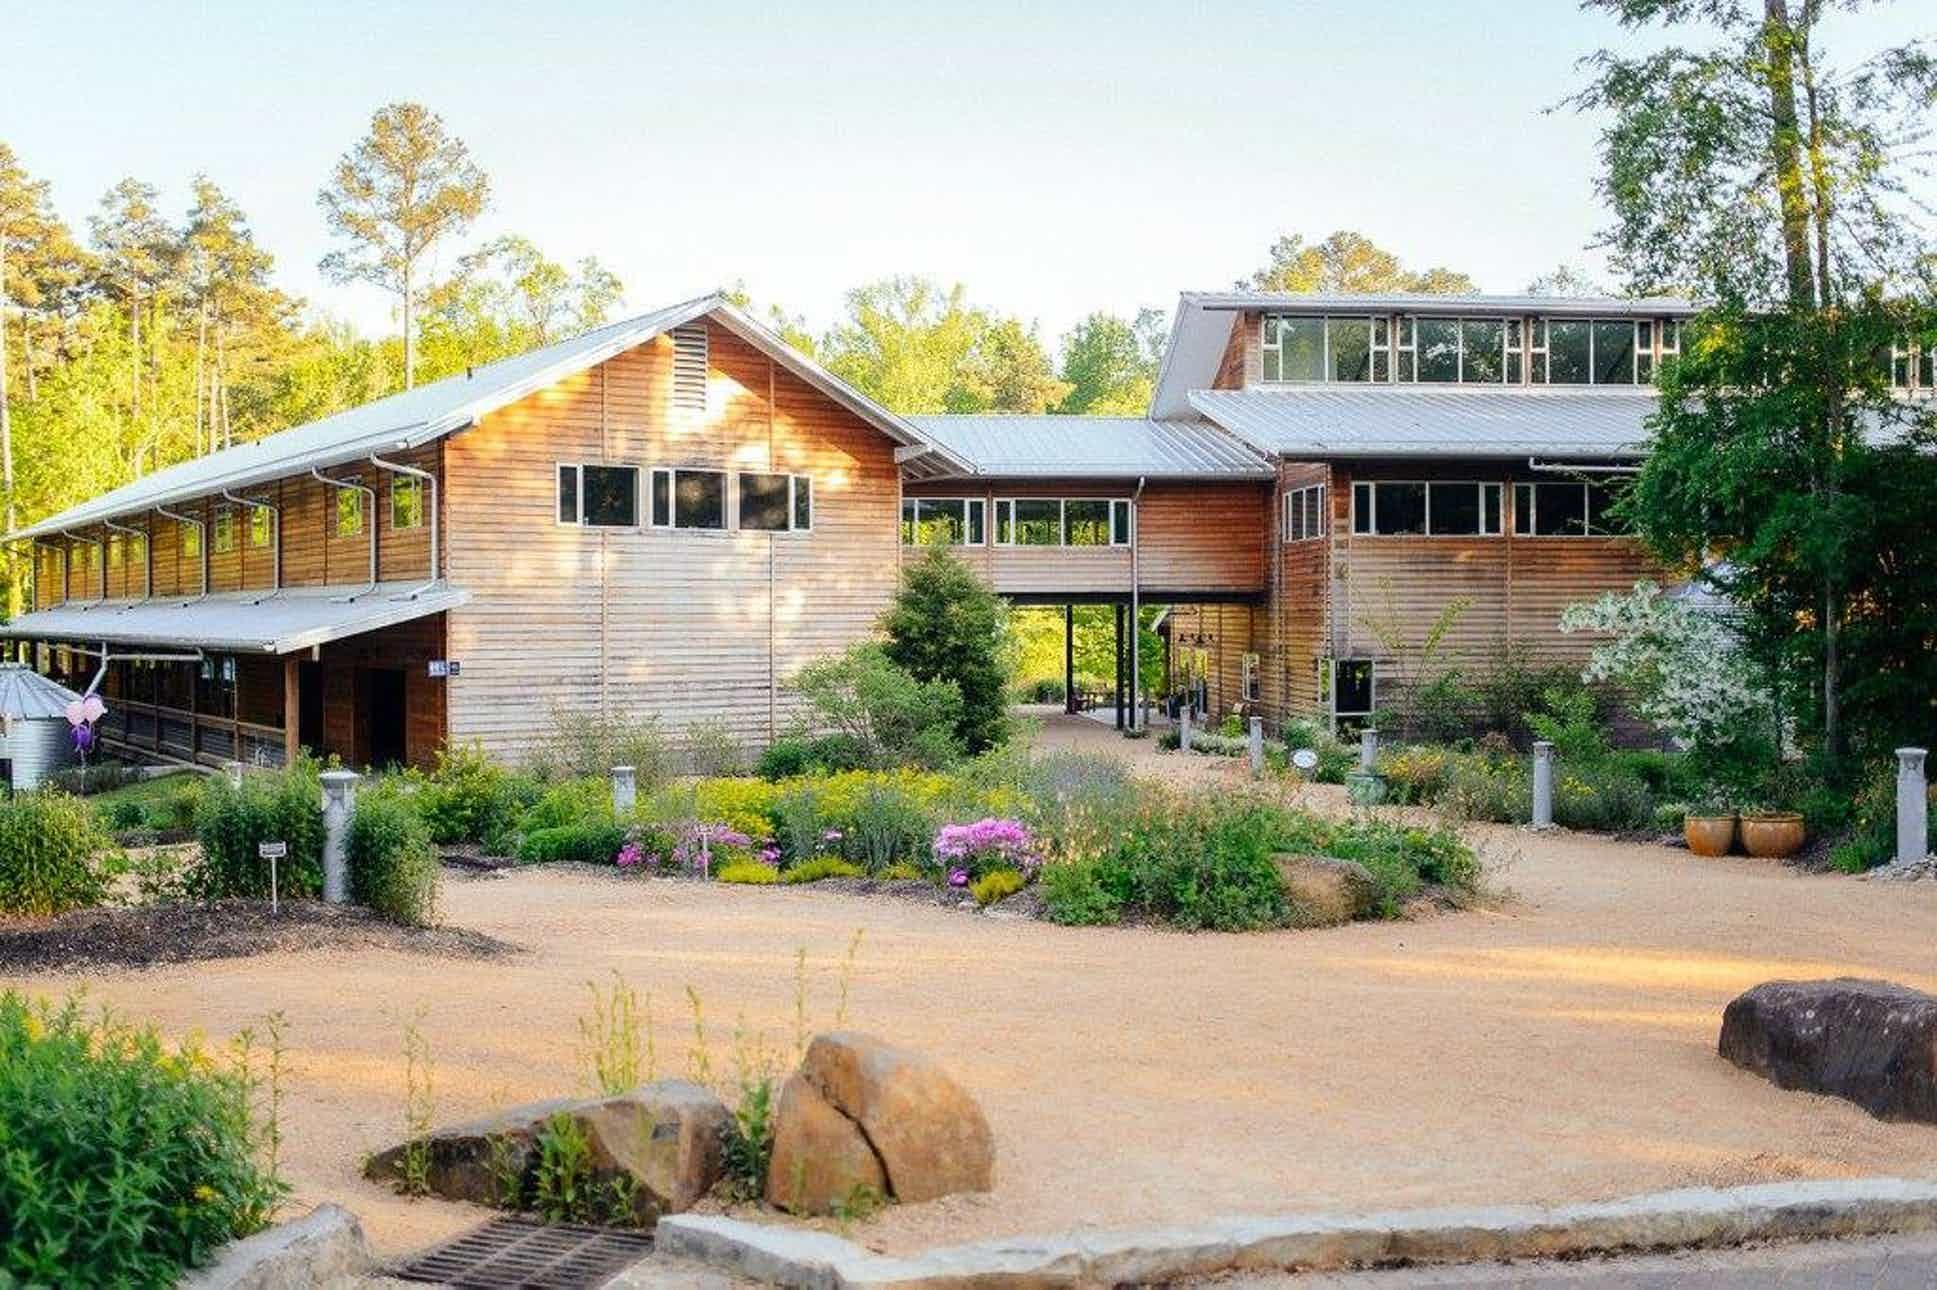 North Carolina Botanical Garden - Chapel Hill, North Carolina #2